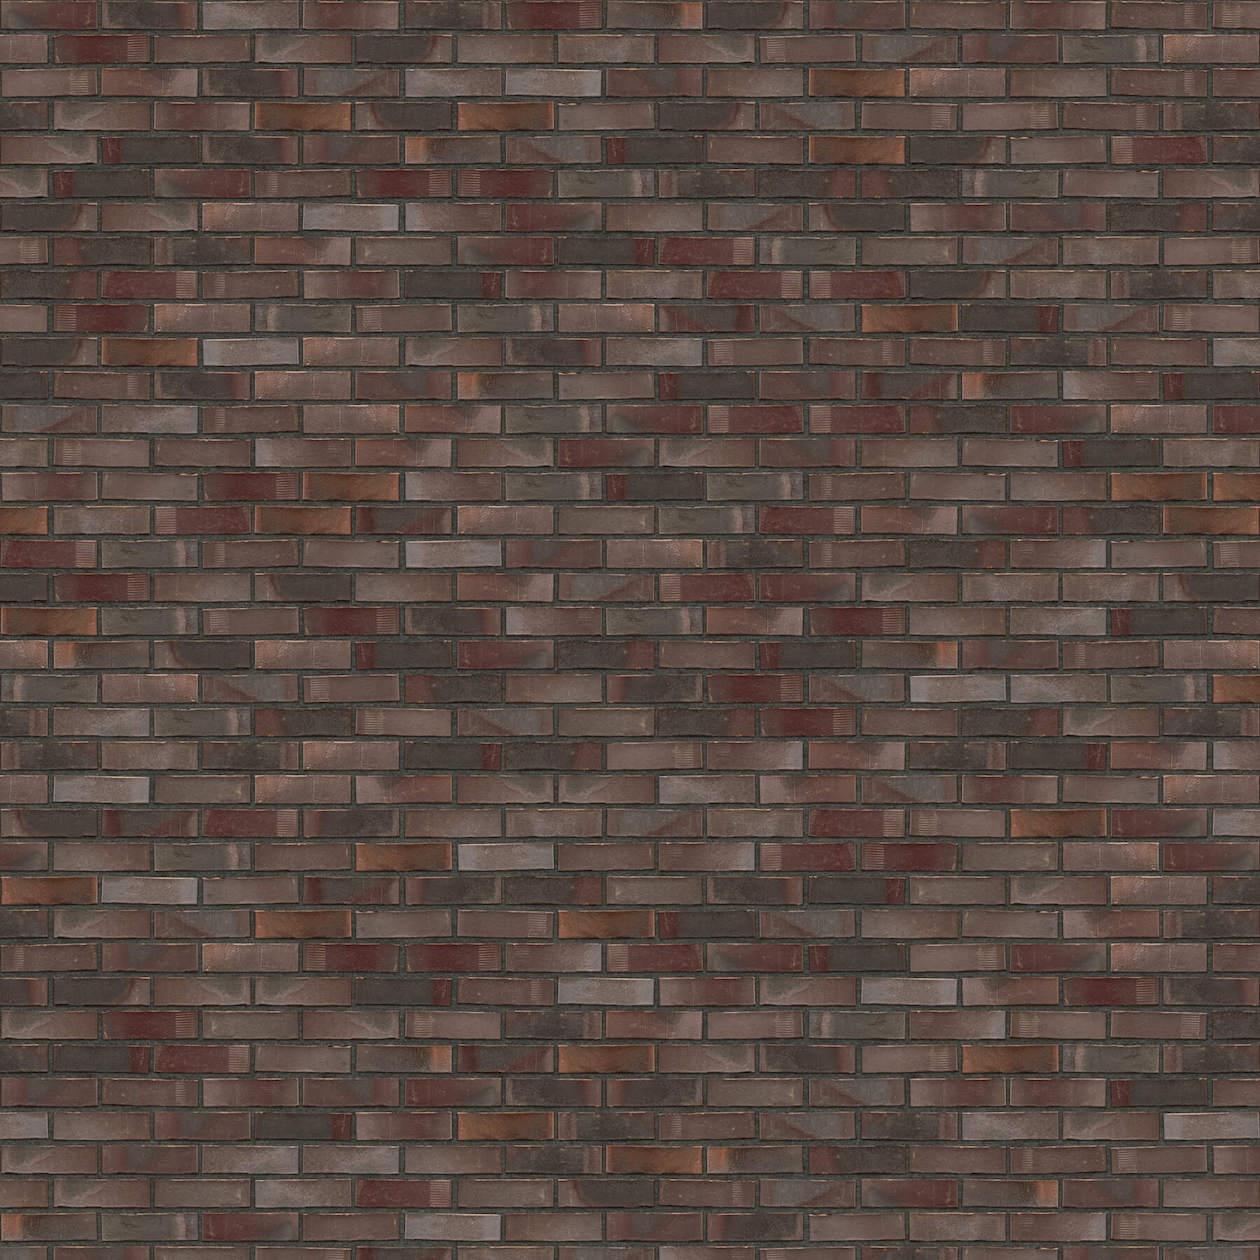 Puna-cigla-FeldHaus-Klinker-brick-house-nf-k-704-Antracit Fuga